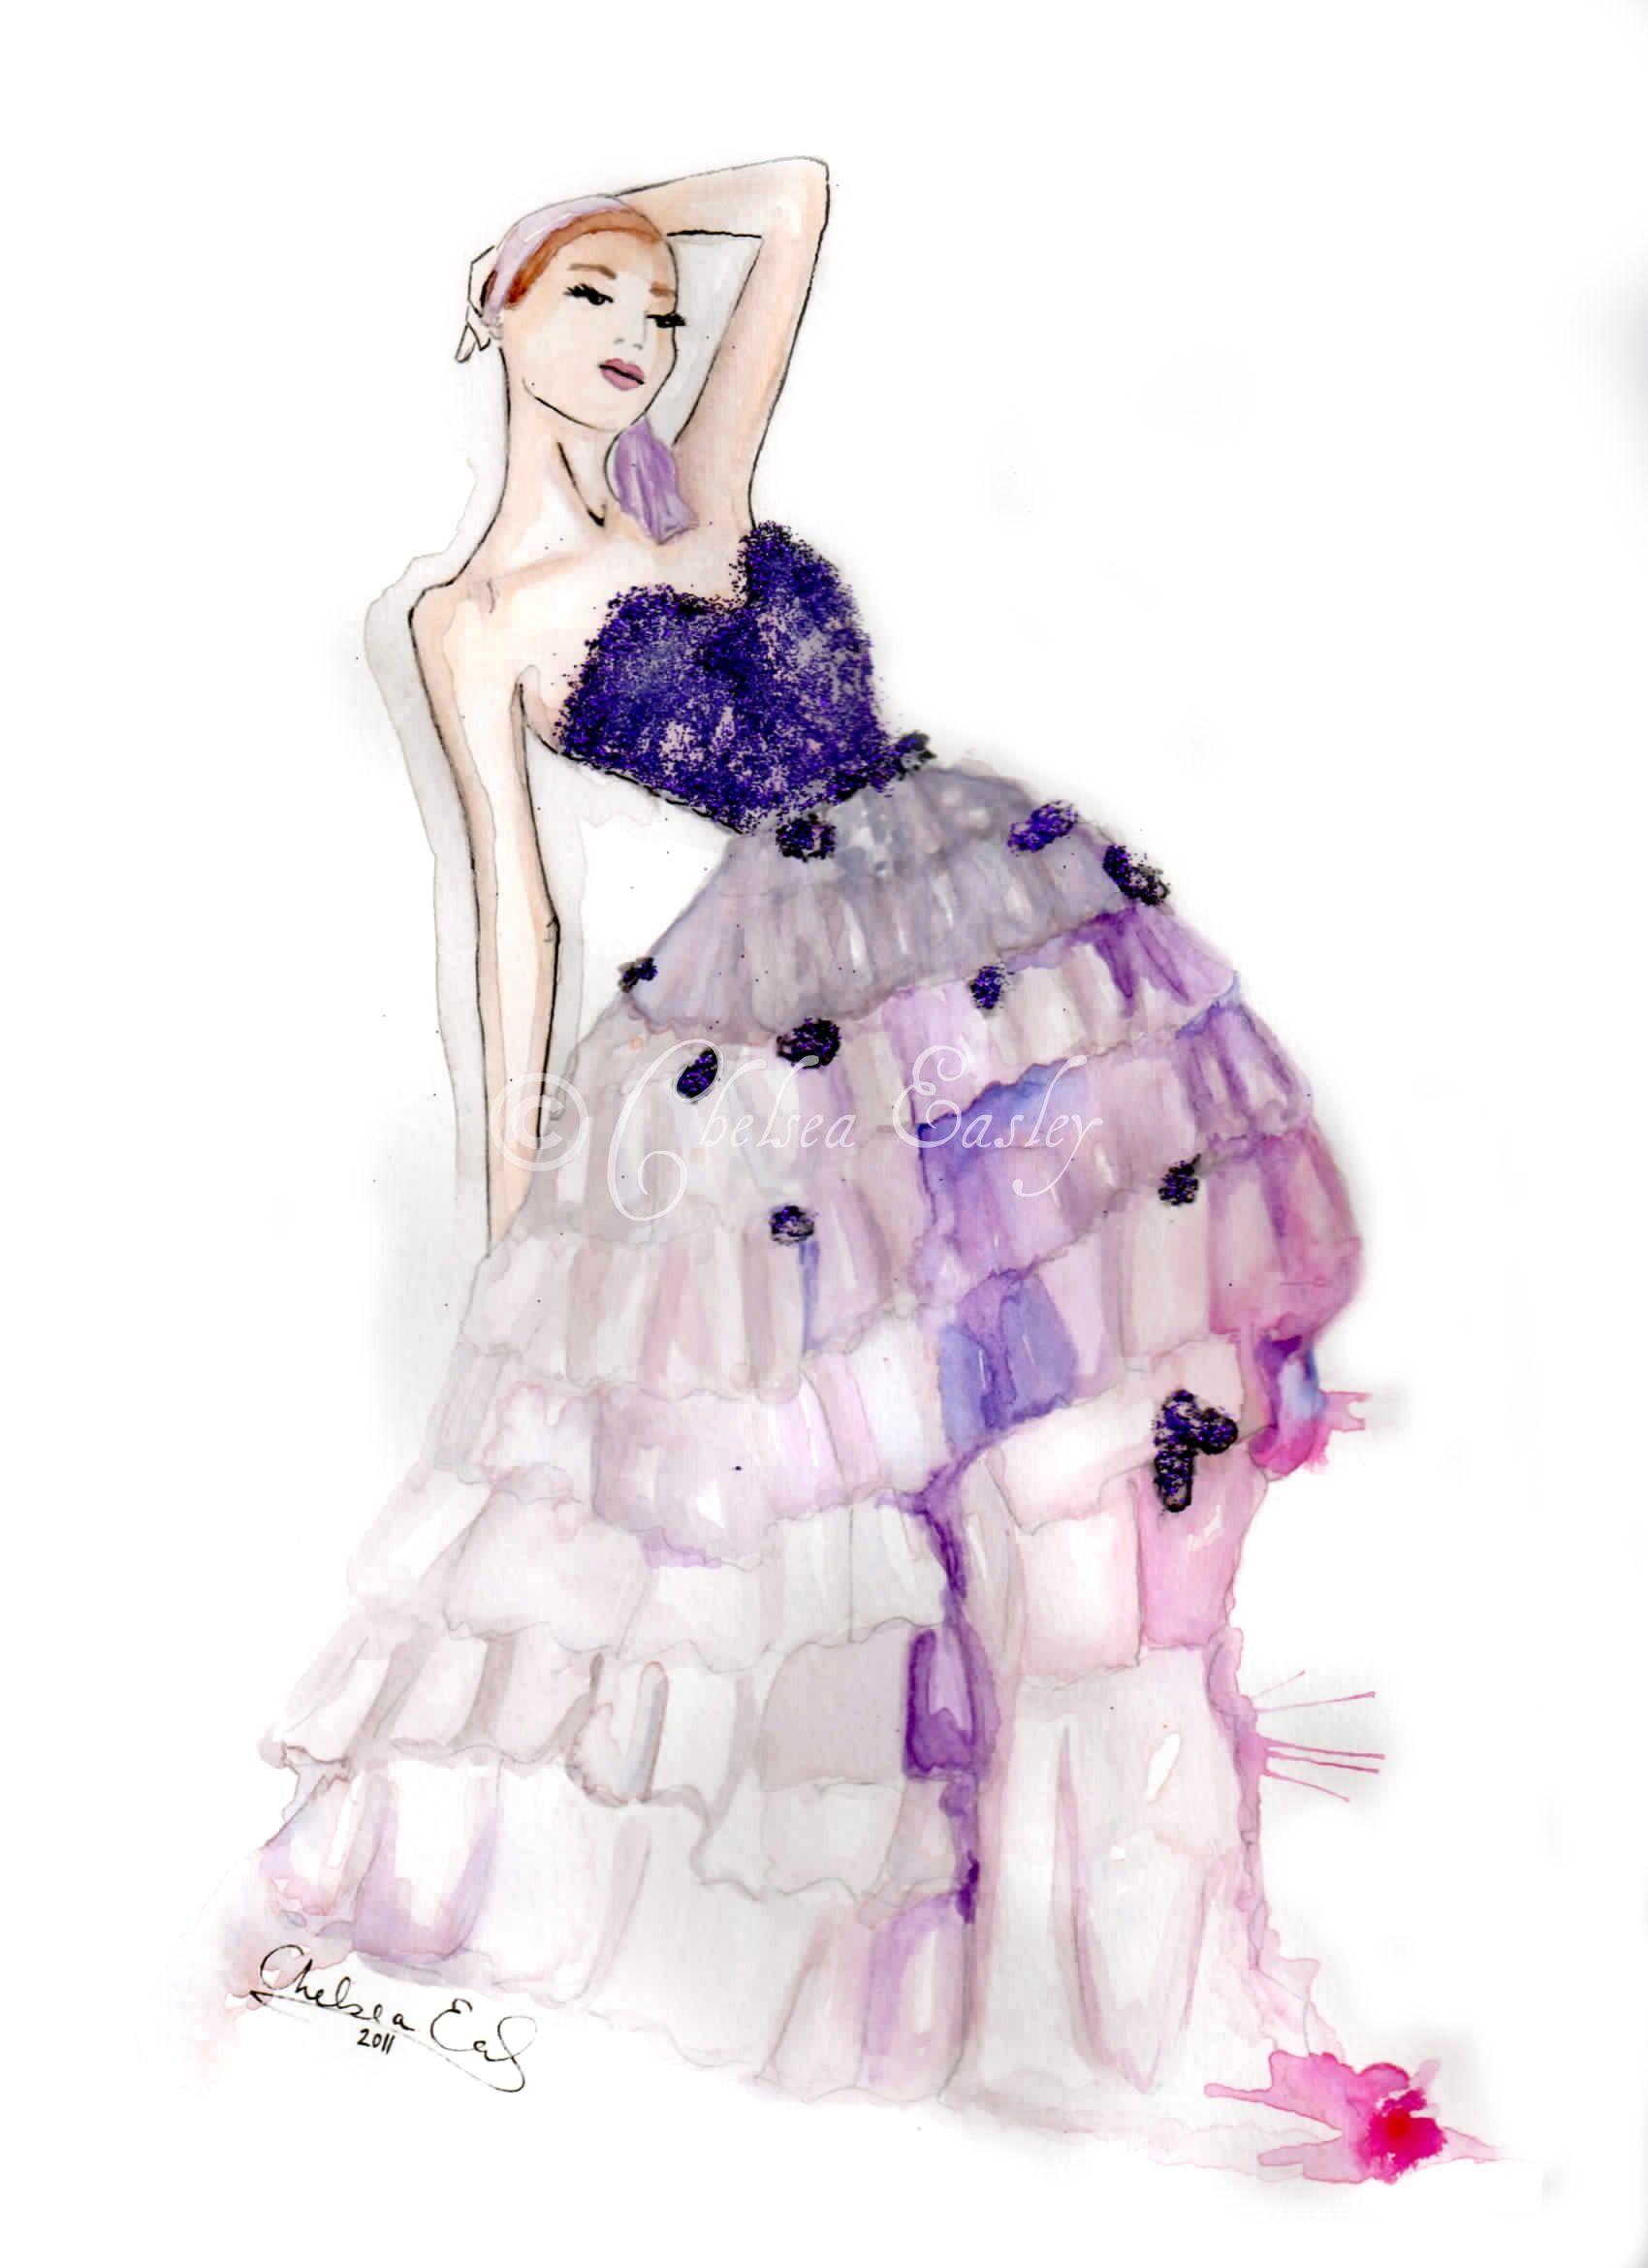 Fashion sketches new fashion sketches -  Fashion Sketches Sketches Pinterest Fashion Sketches Sketches And Fashion Illustrations